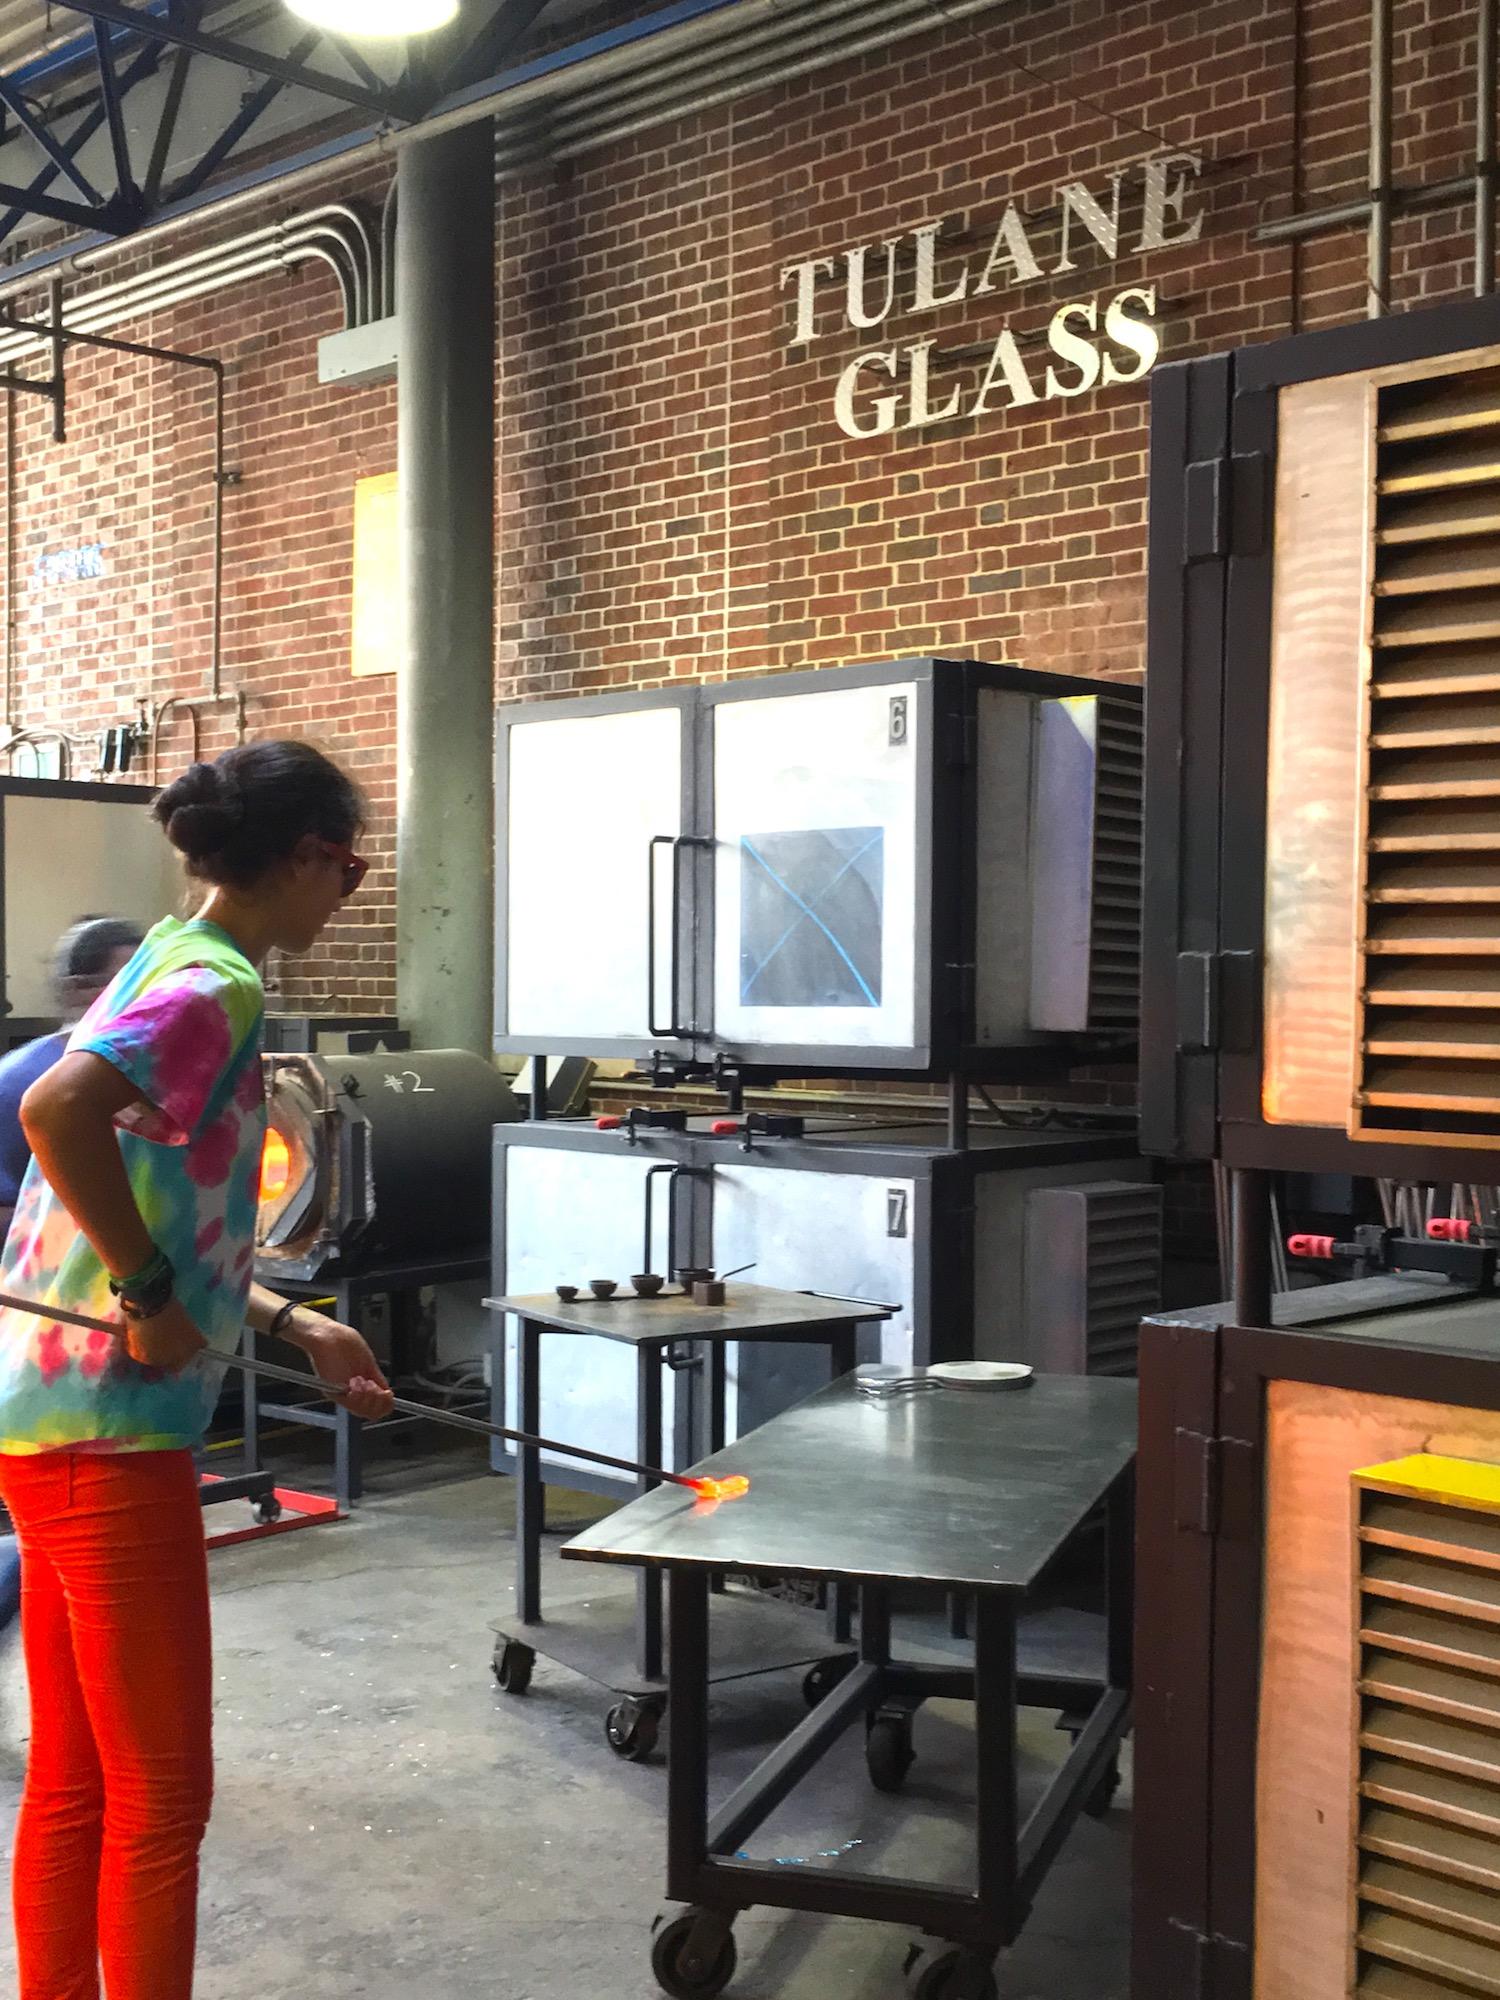 Tulane-Glassblowing-Class.jpg